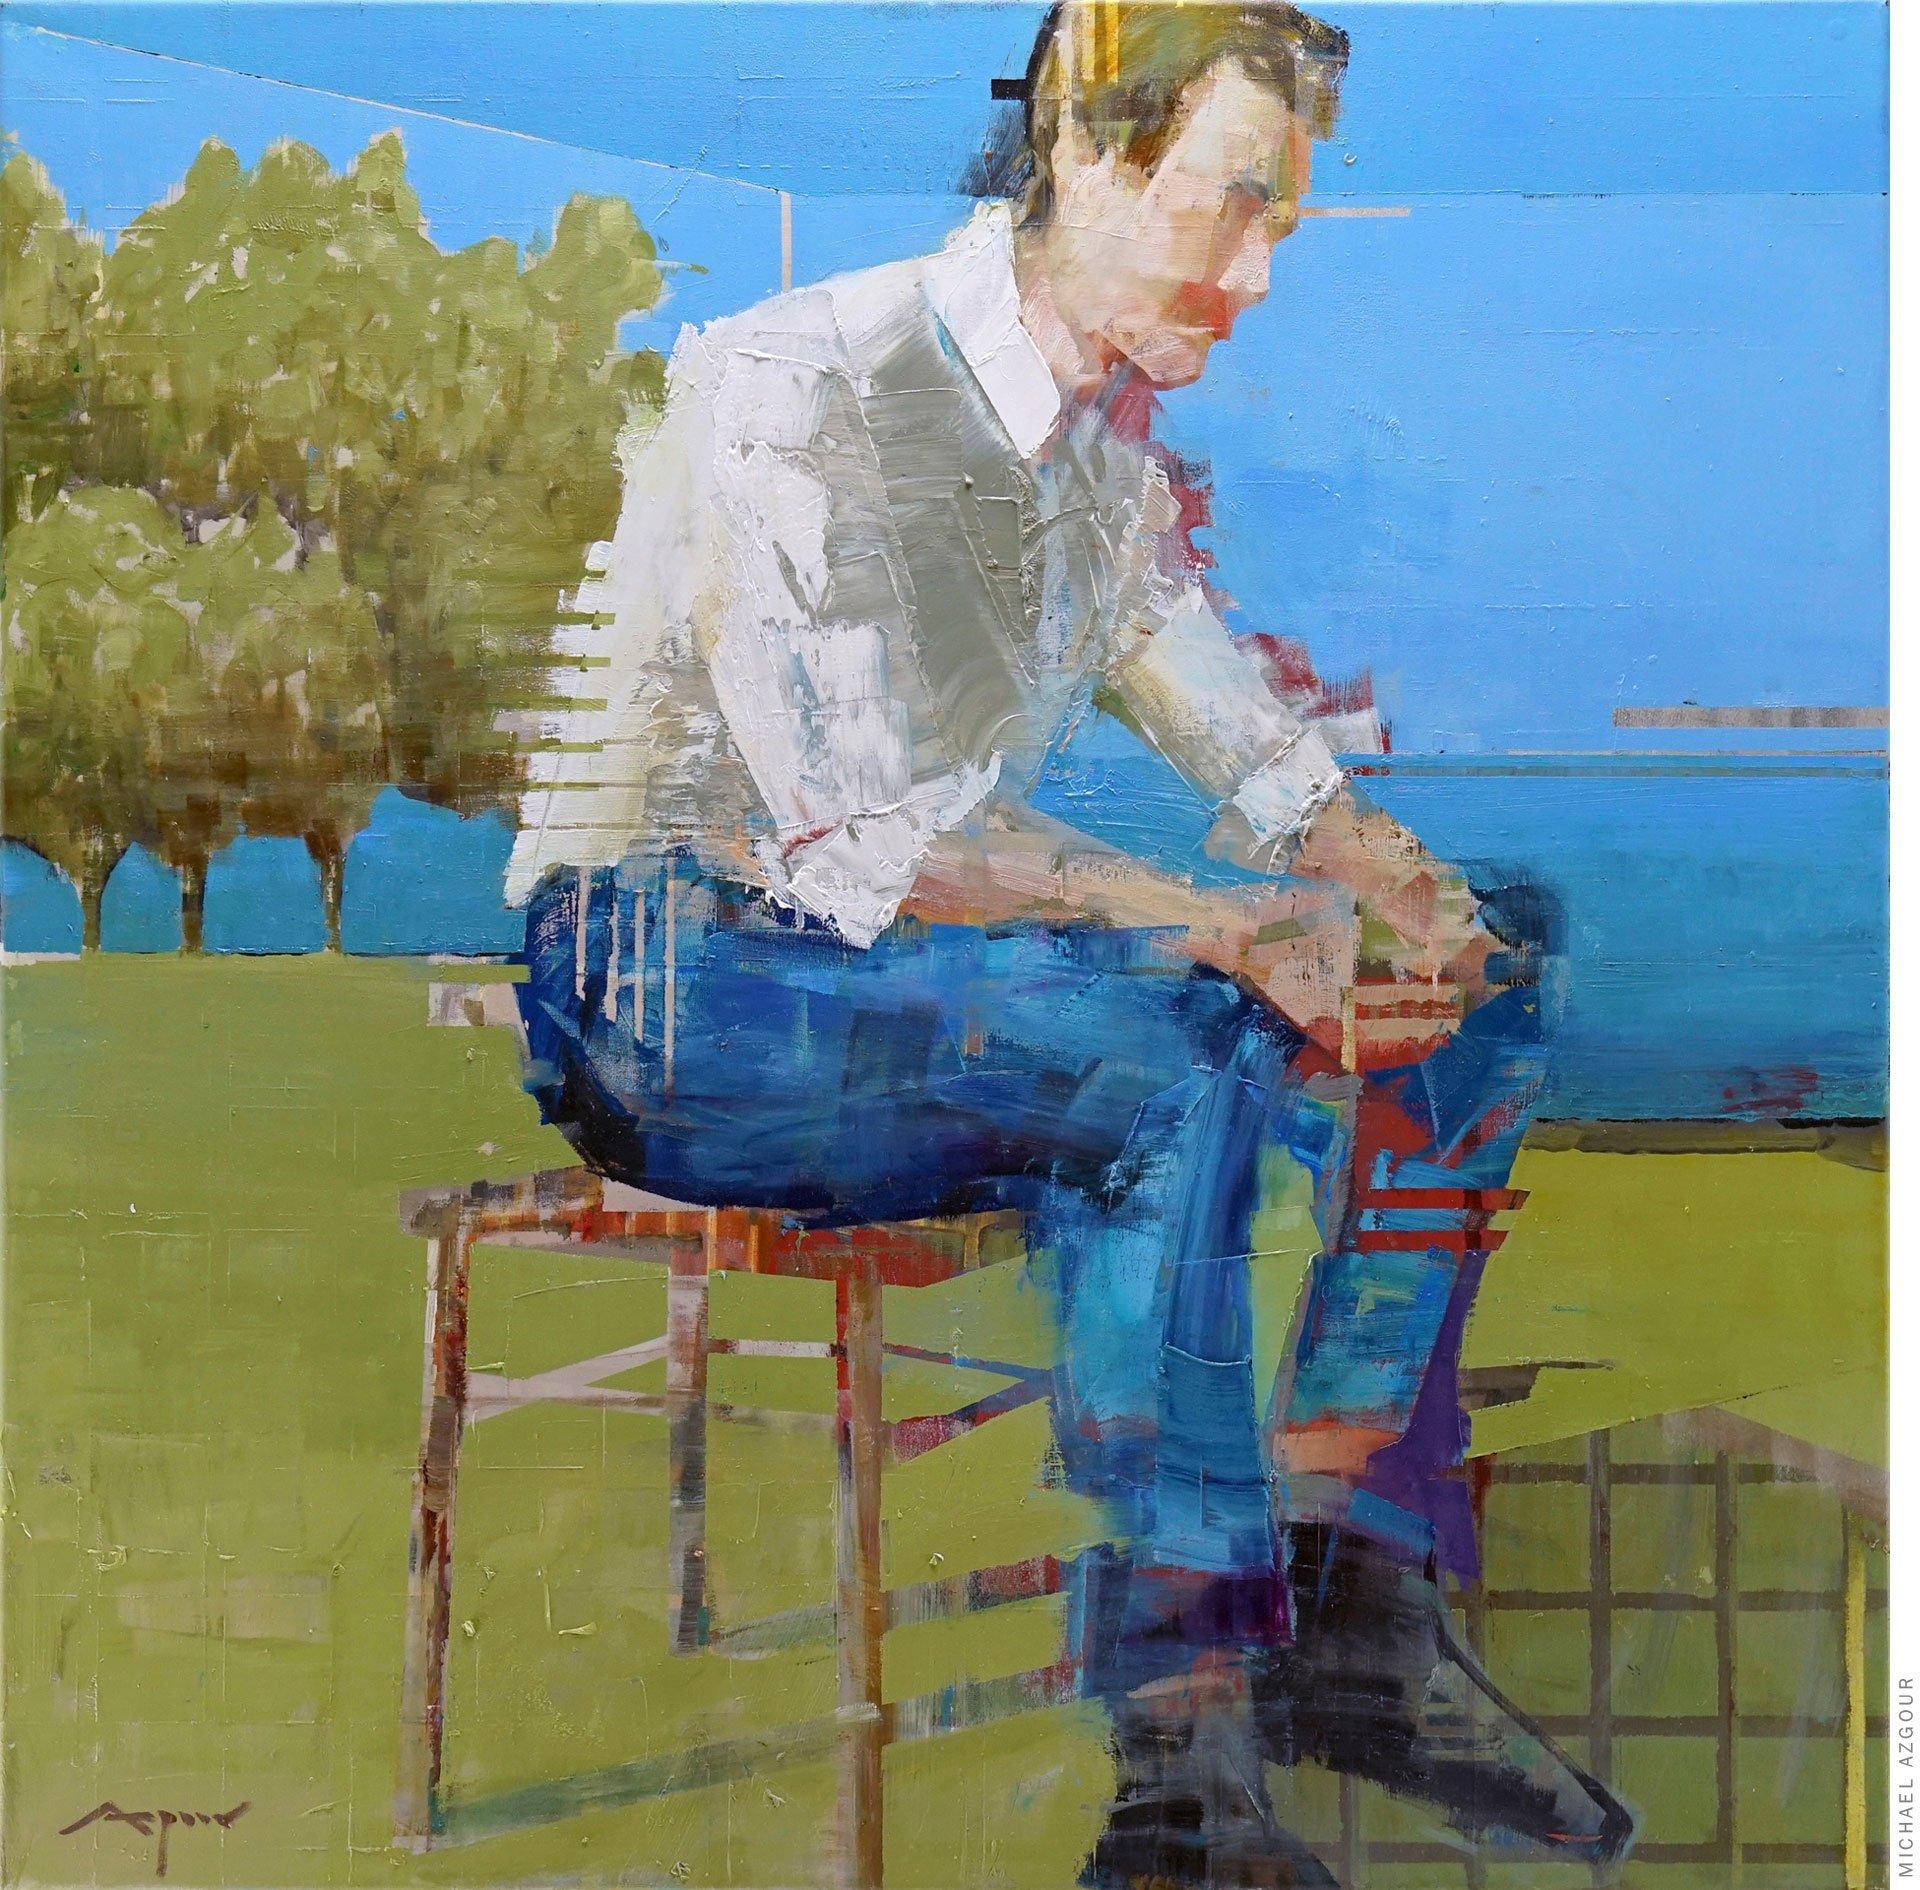 Integration: Man Seated